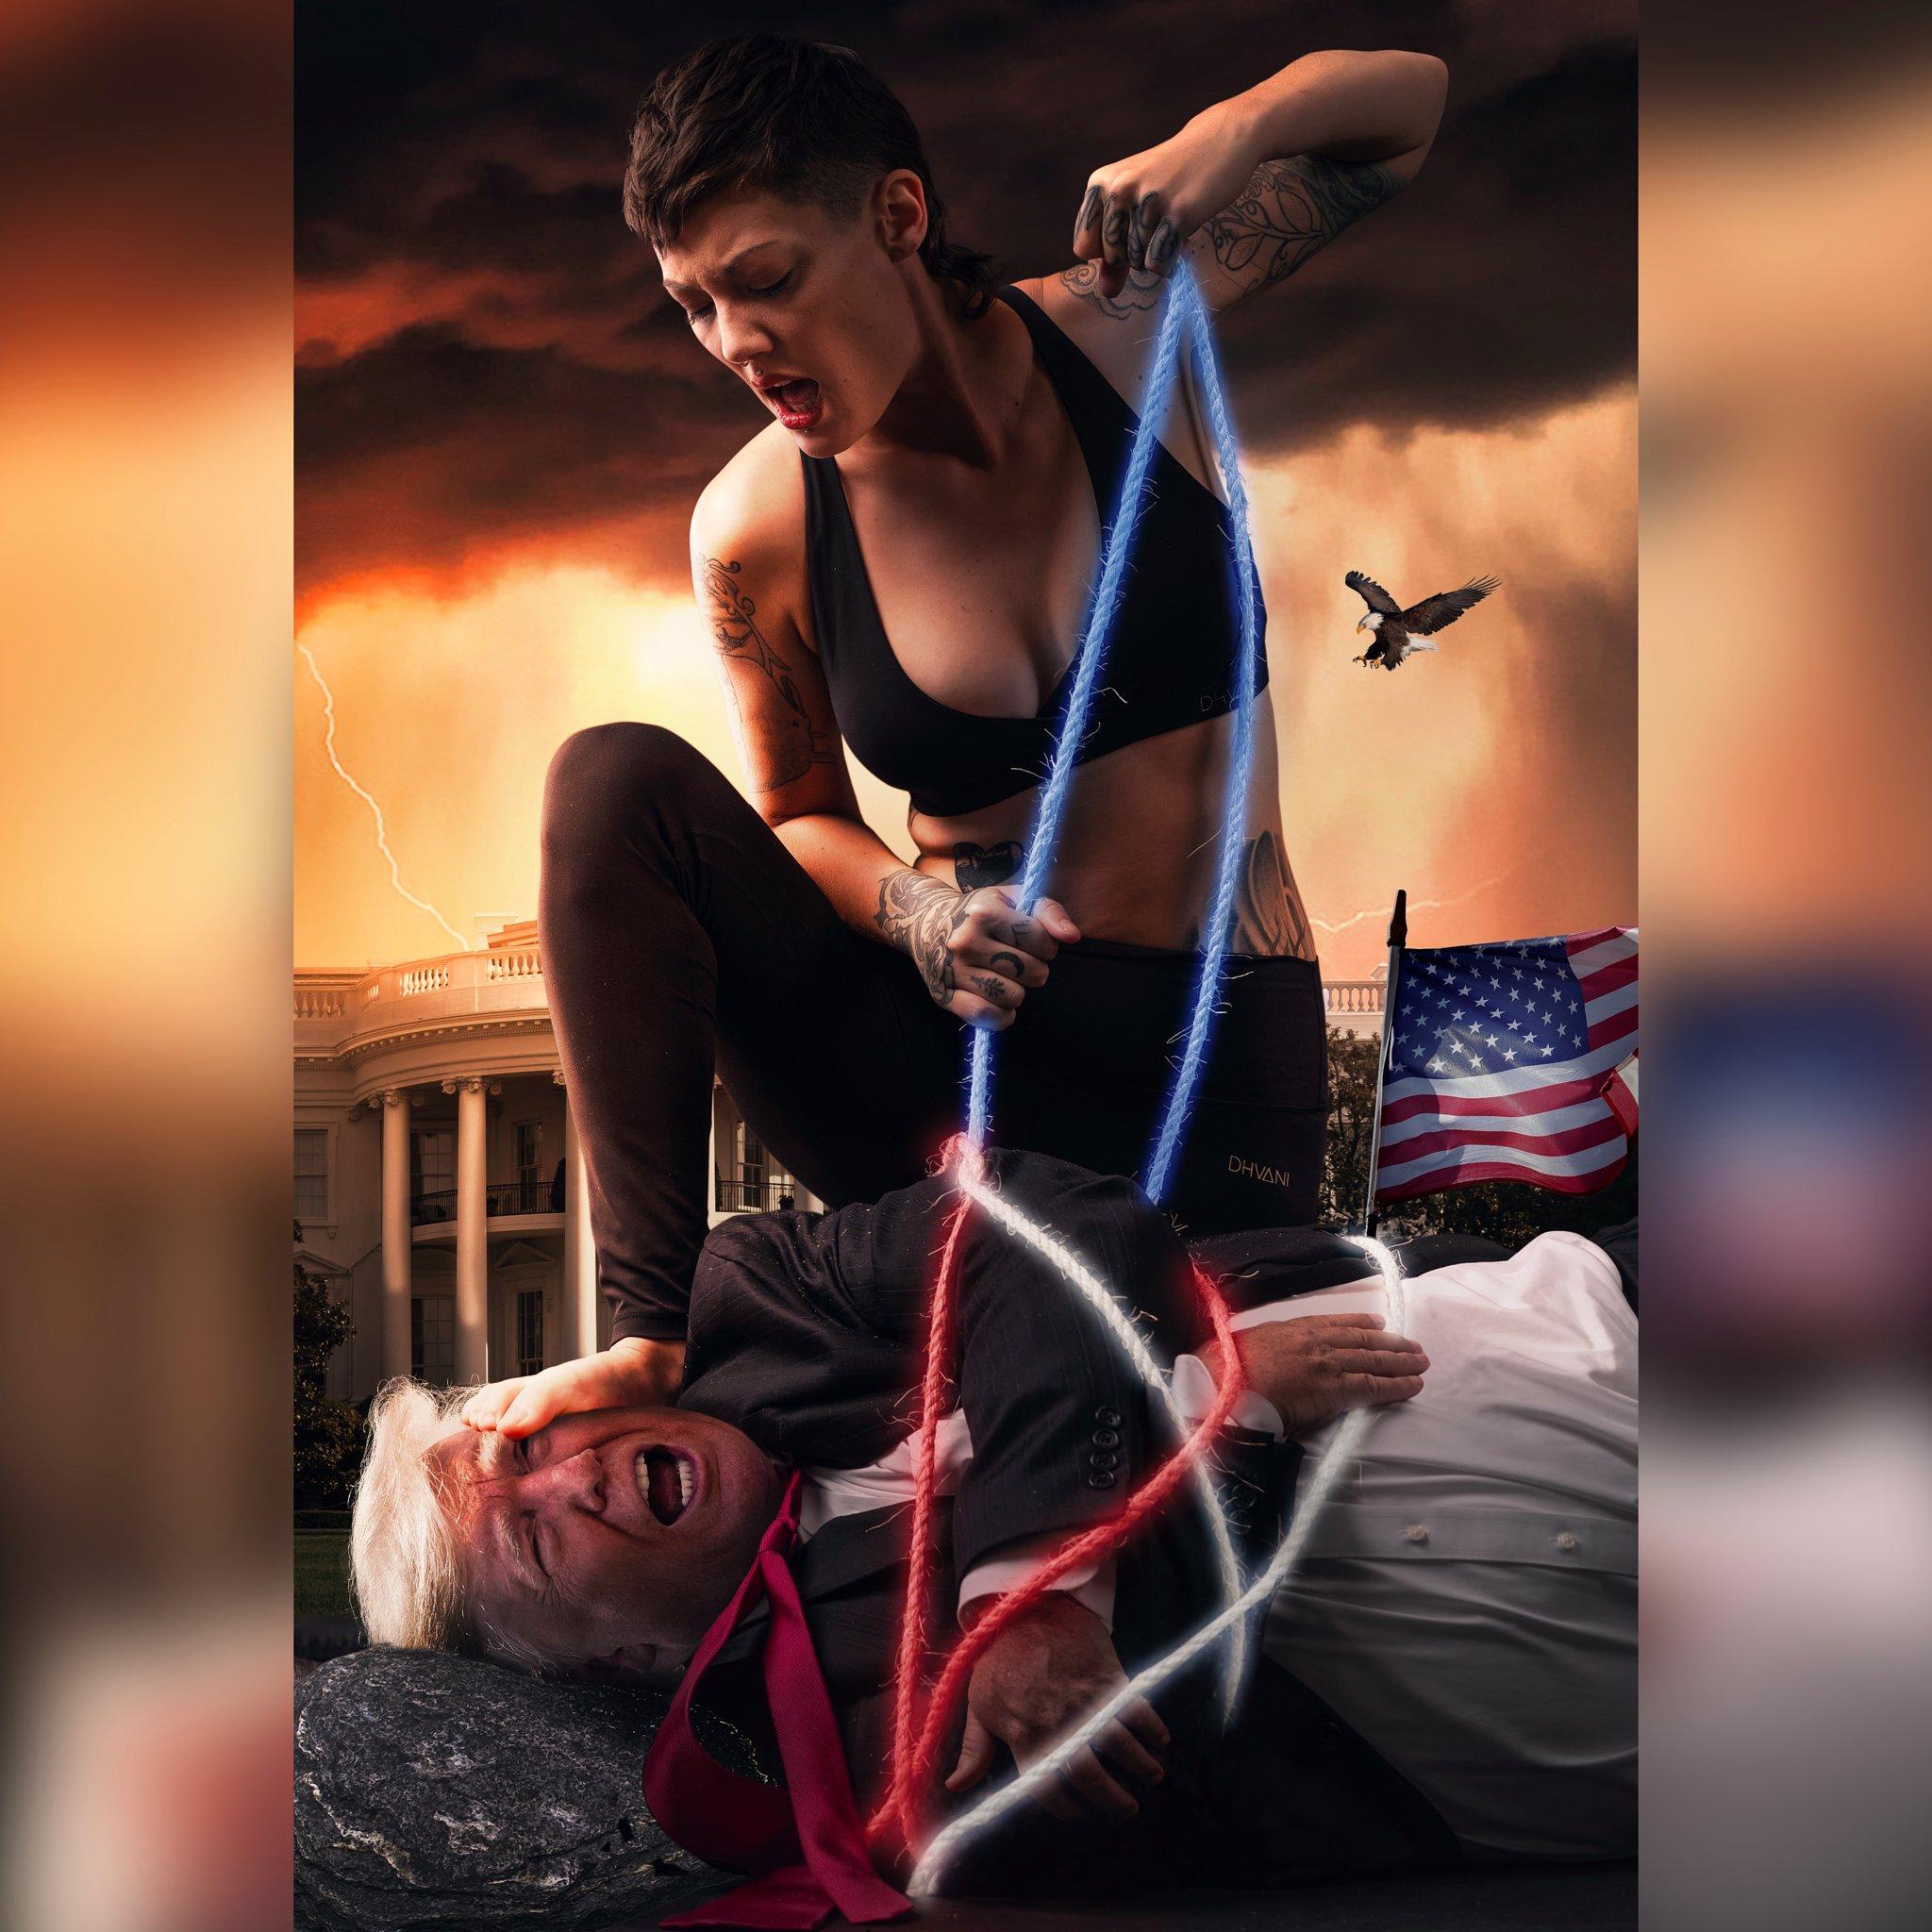 Woman tying up President Trump